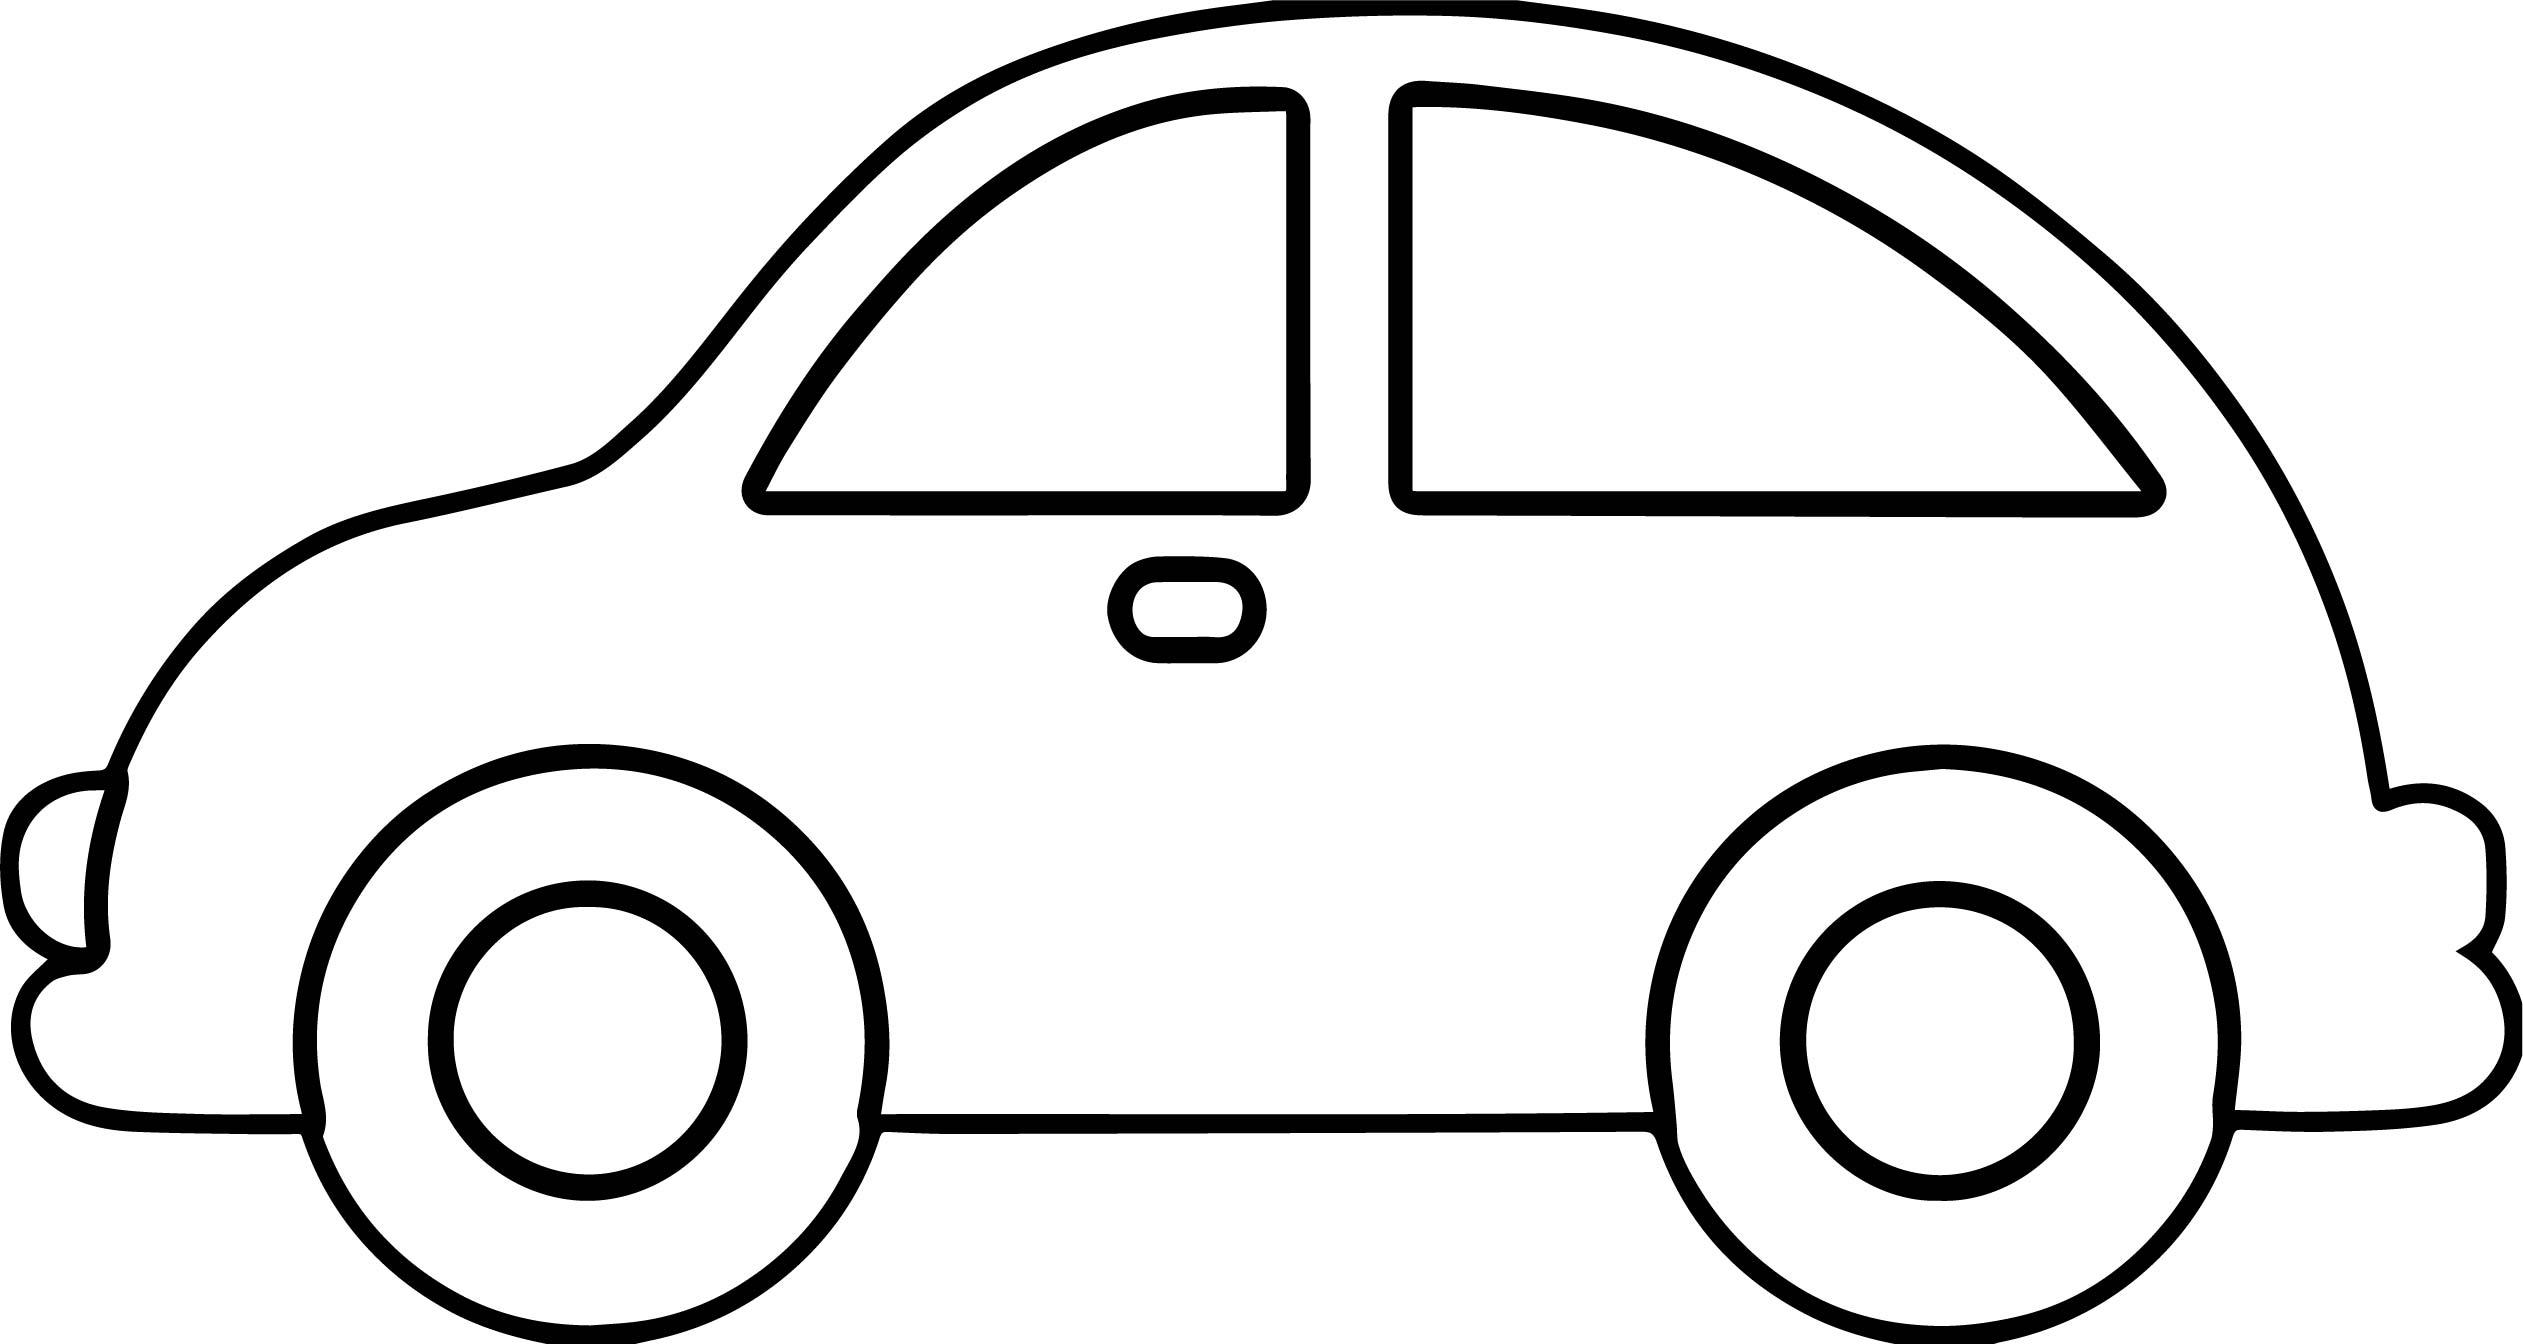 Car Clipart Outline.